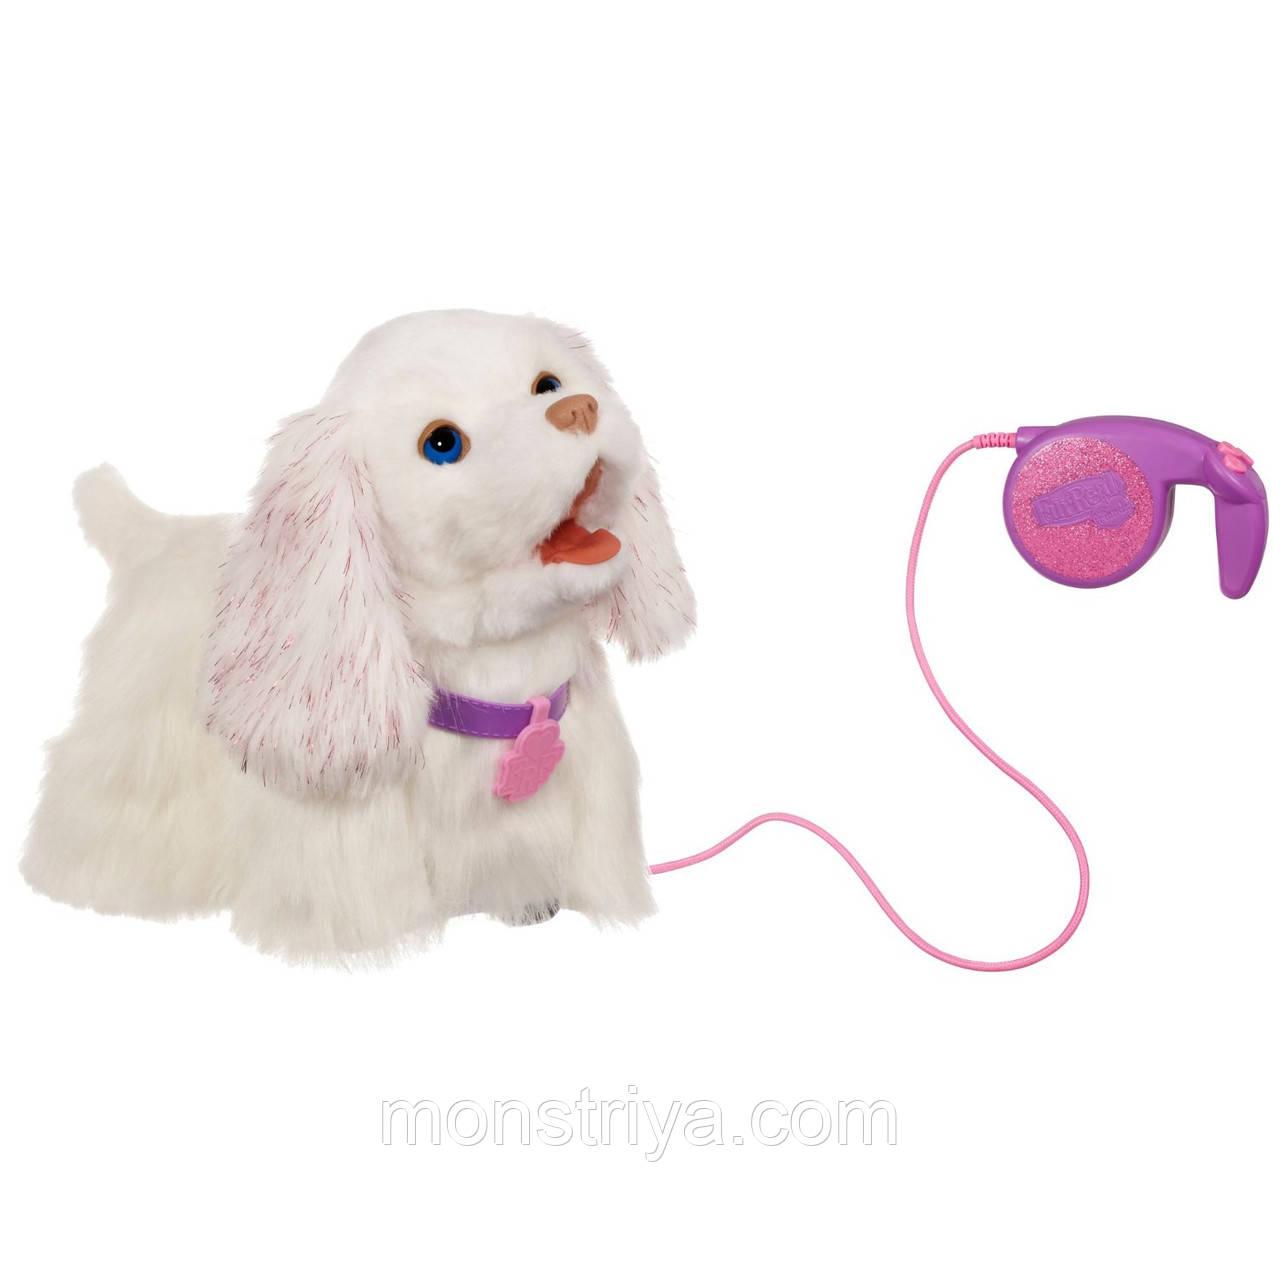 Fur Real Friends Інтерактивне щеня Го-Го (Go-Go)